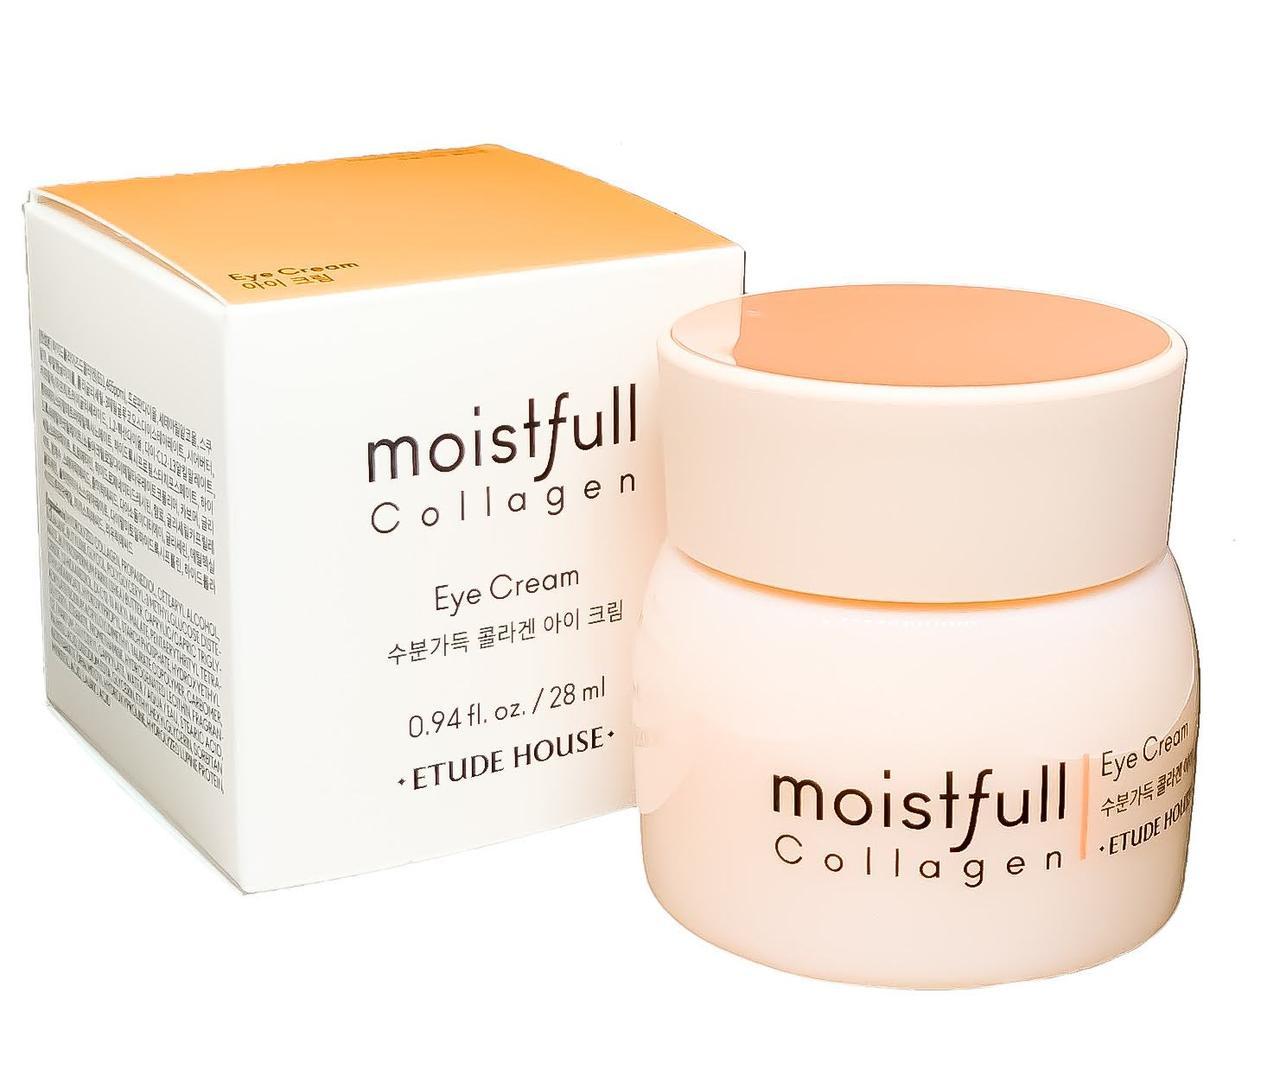 Коллагеновый крем для век Etude House Moistfull Collagen Eye Cream